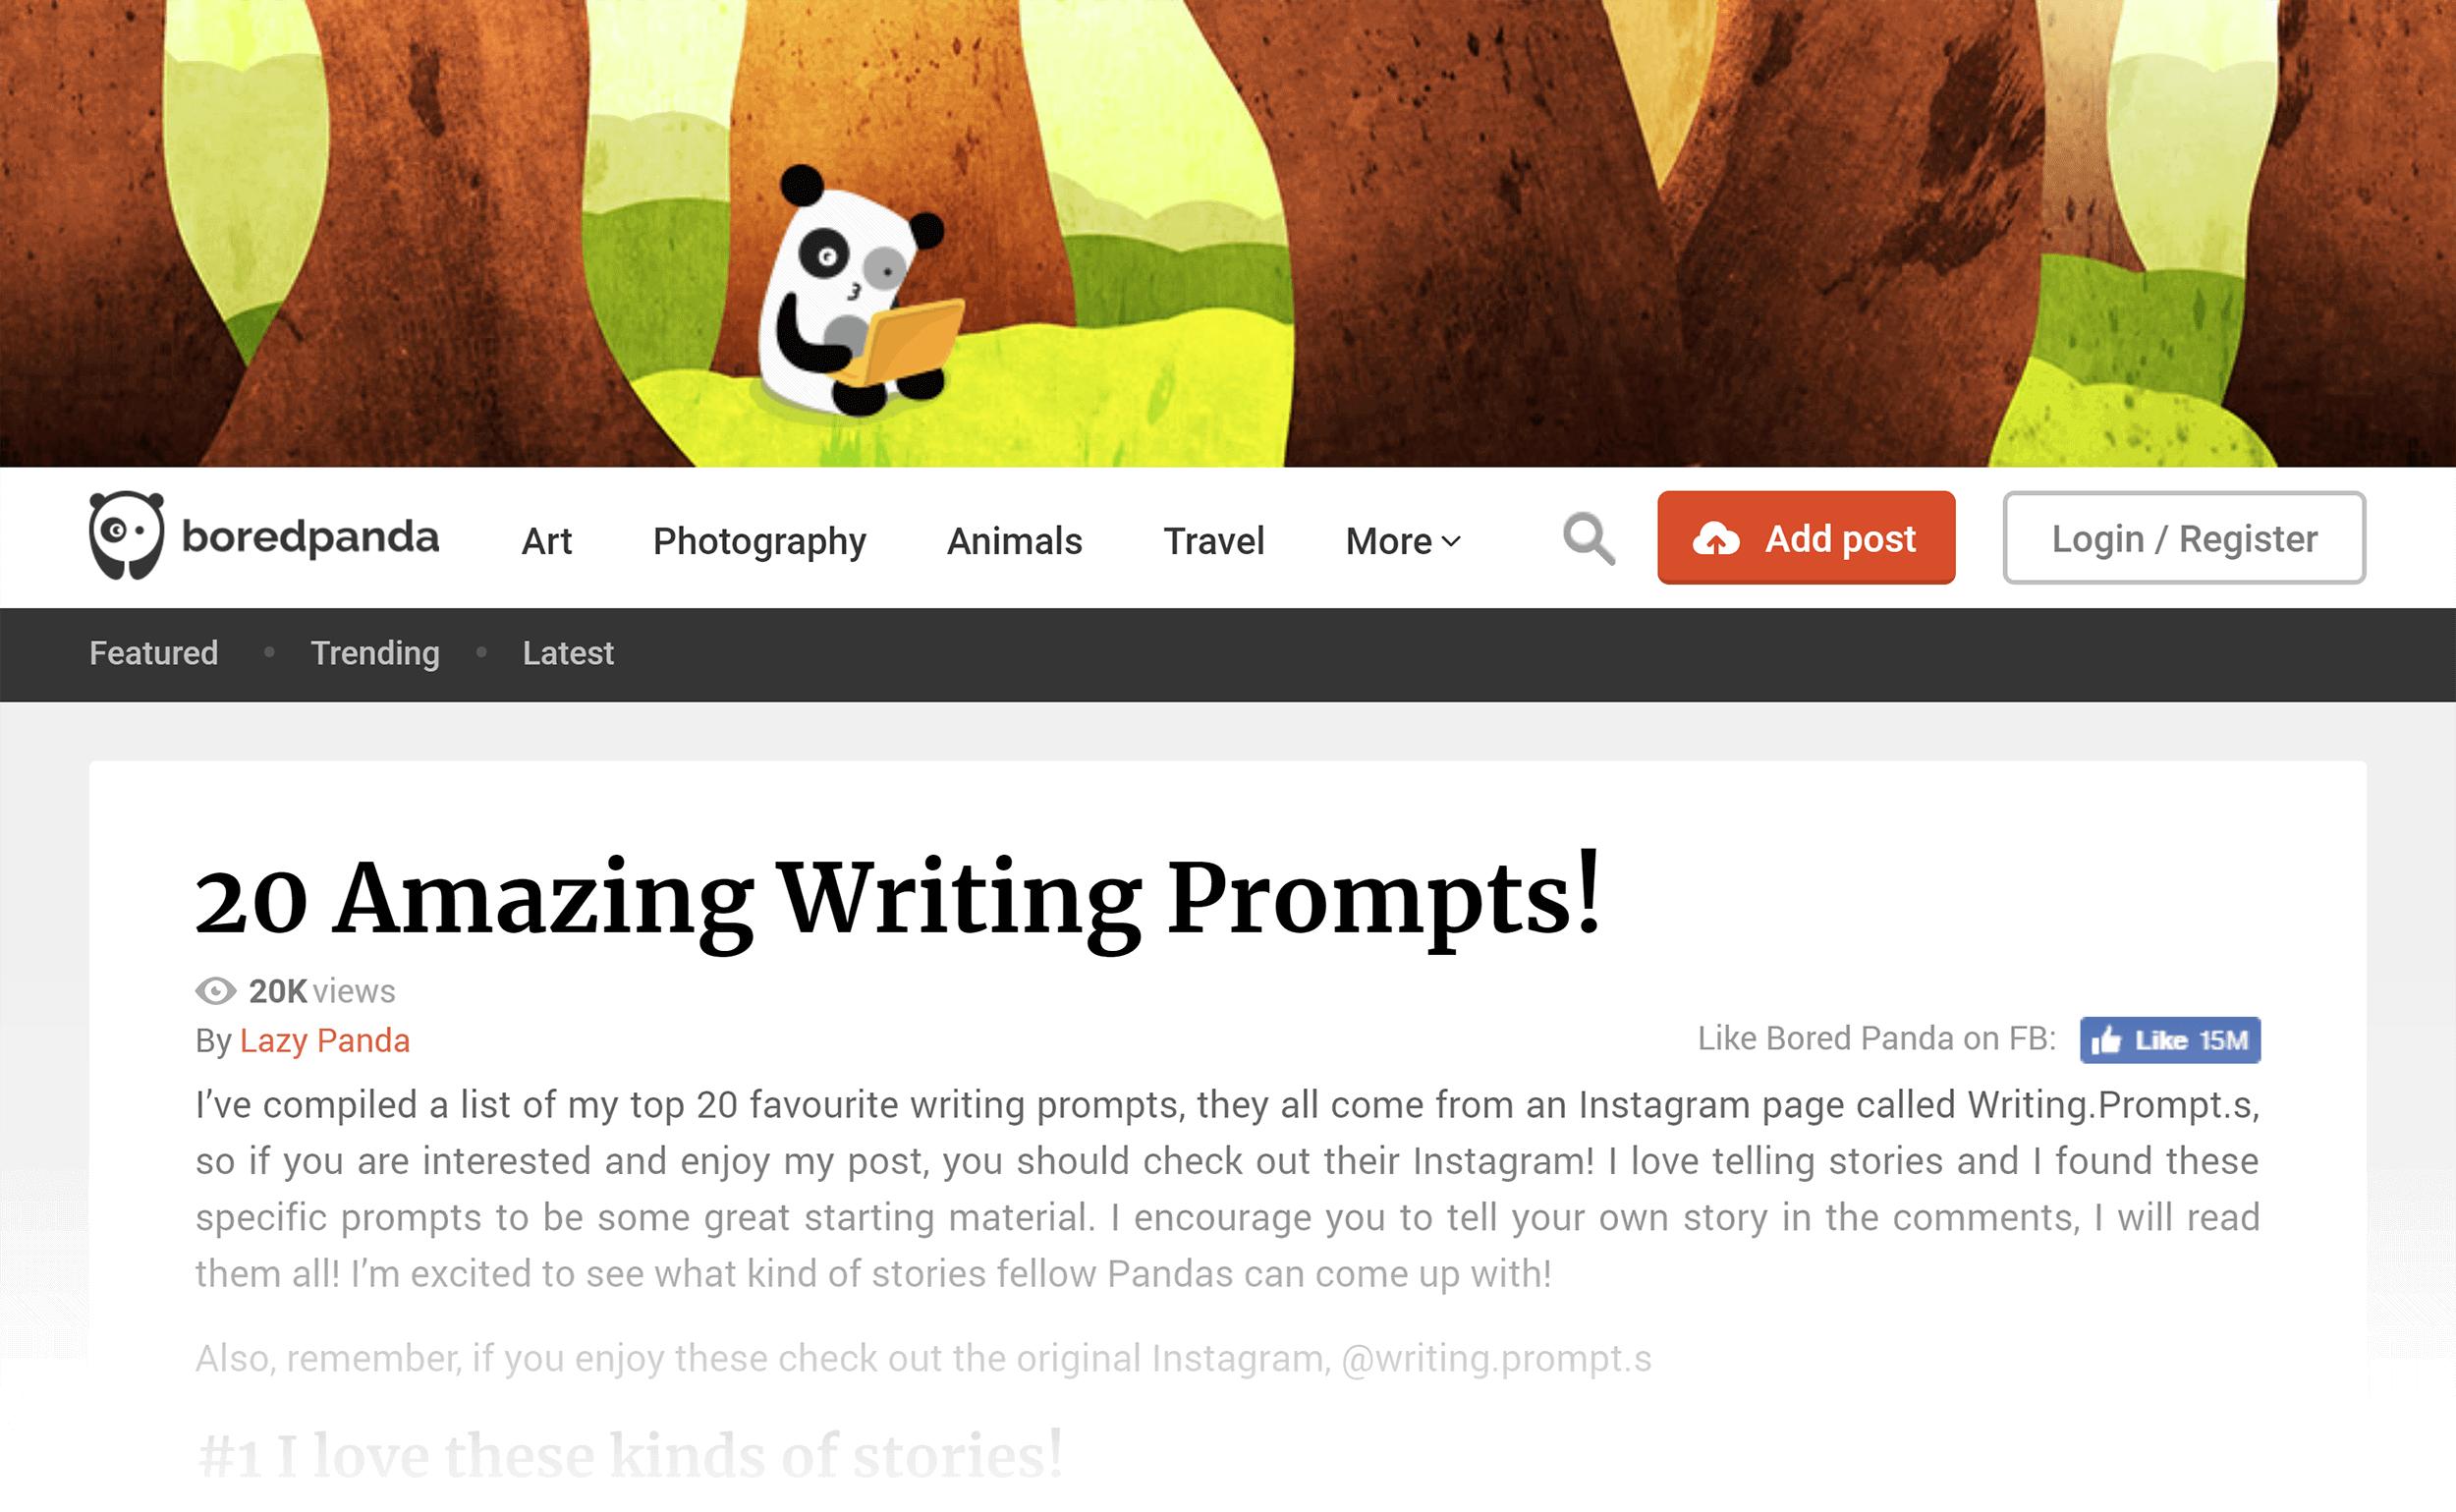 20 amazing writing prompts